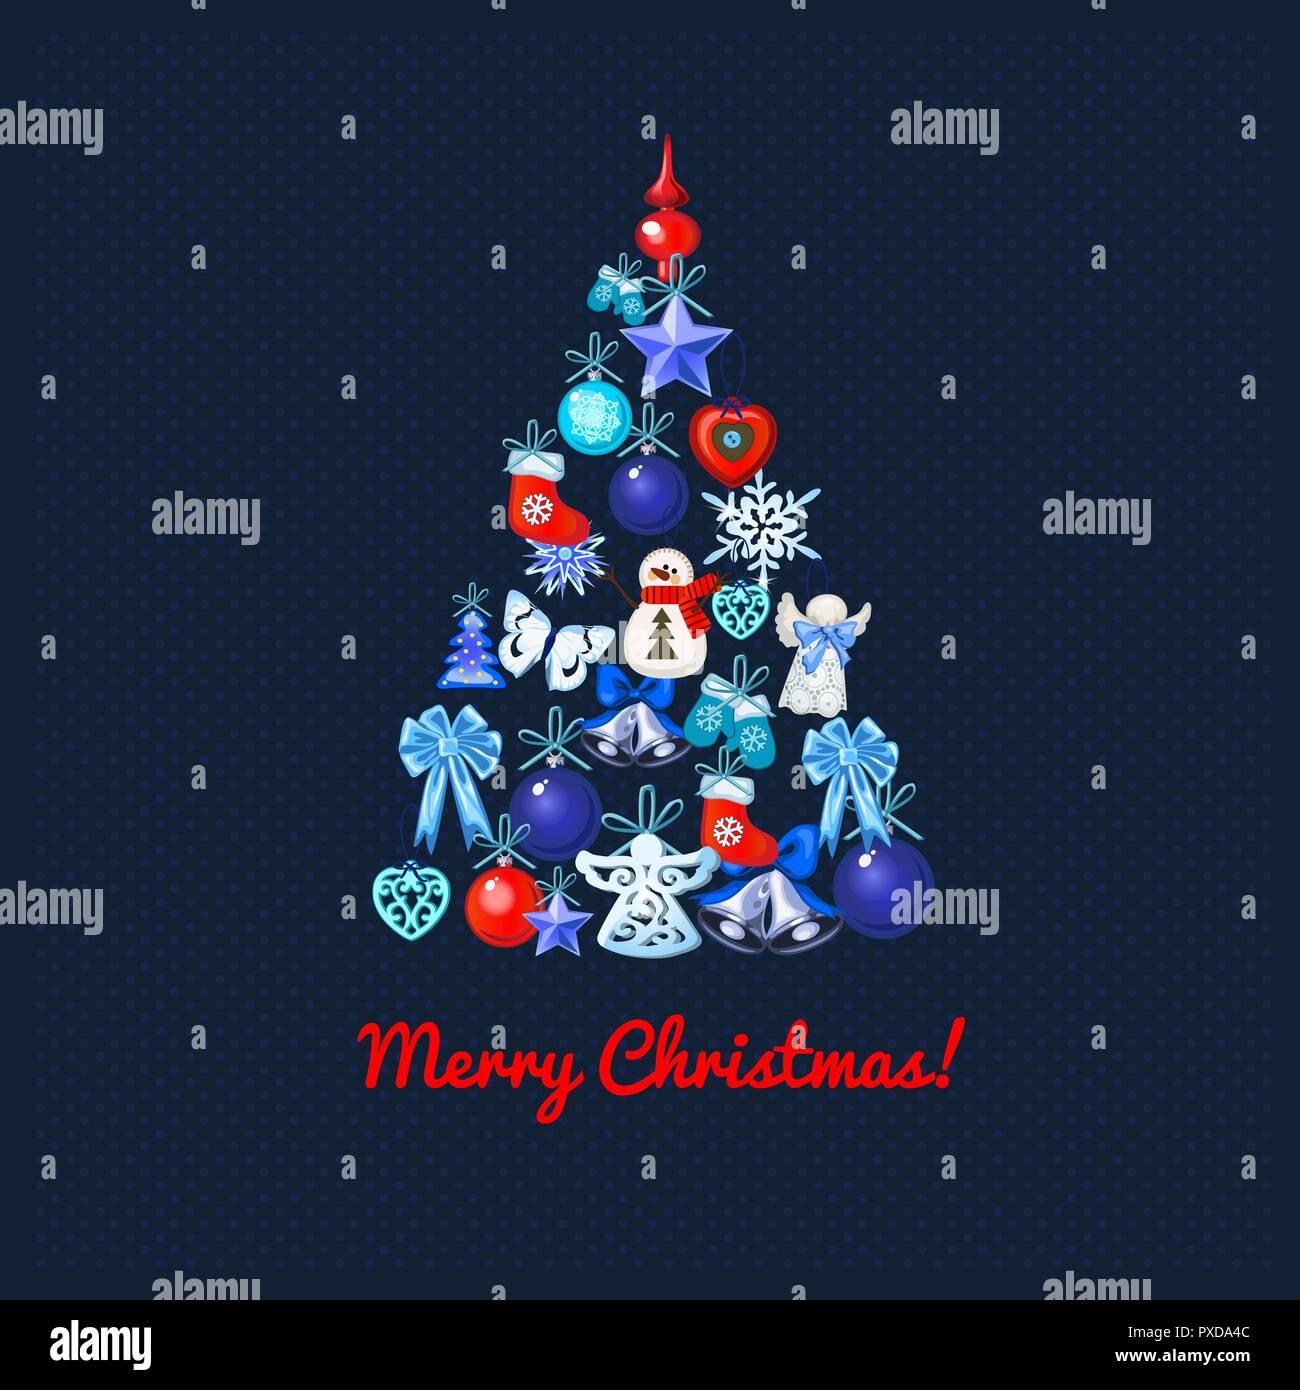 Cartoon Illustration Words Merry Christmas Stockfotos & Cartoon ...